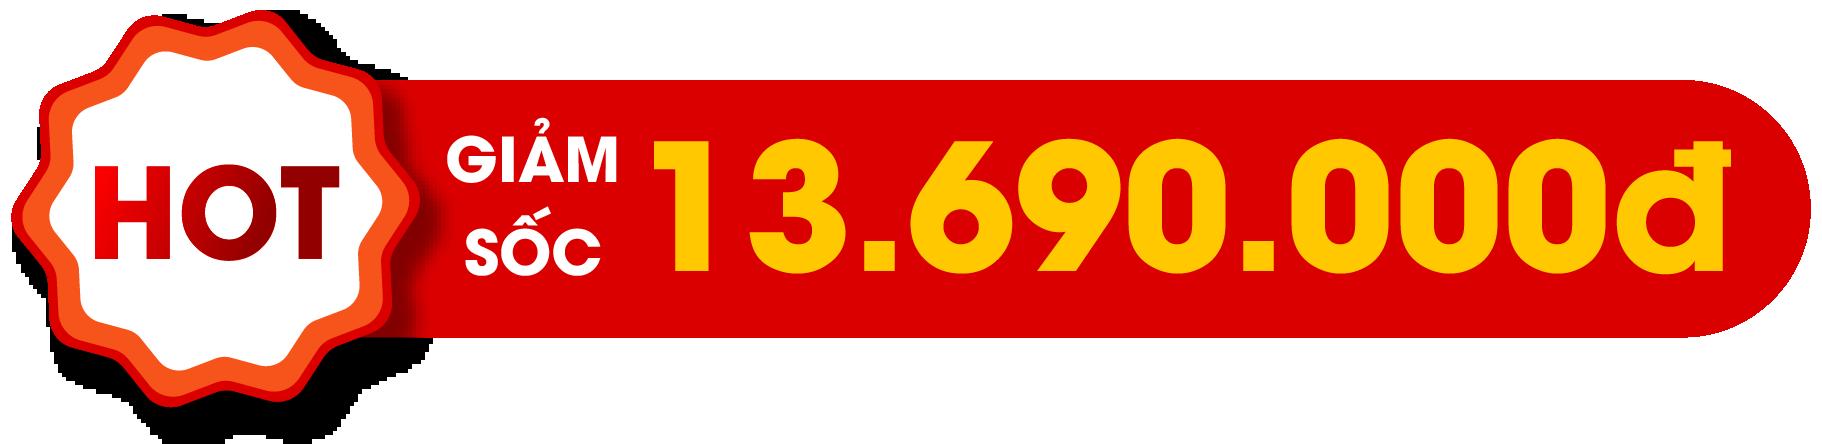 iPhone 11 64GB giá sốc